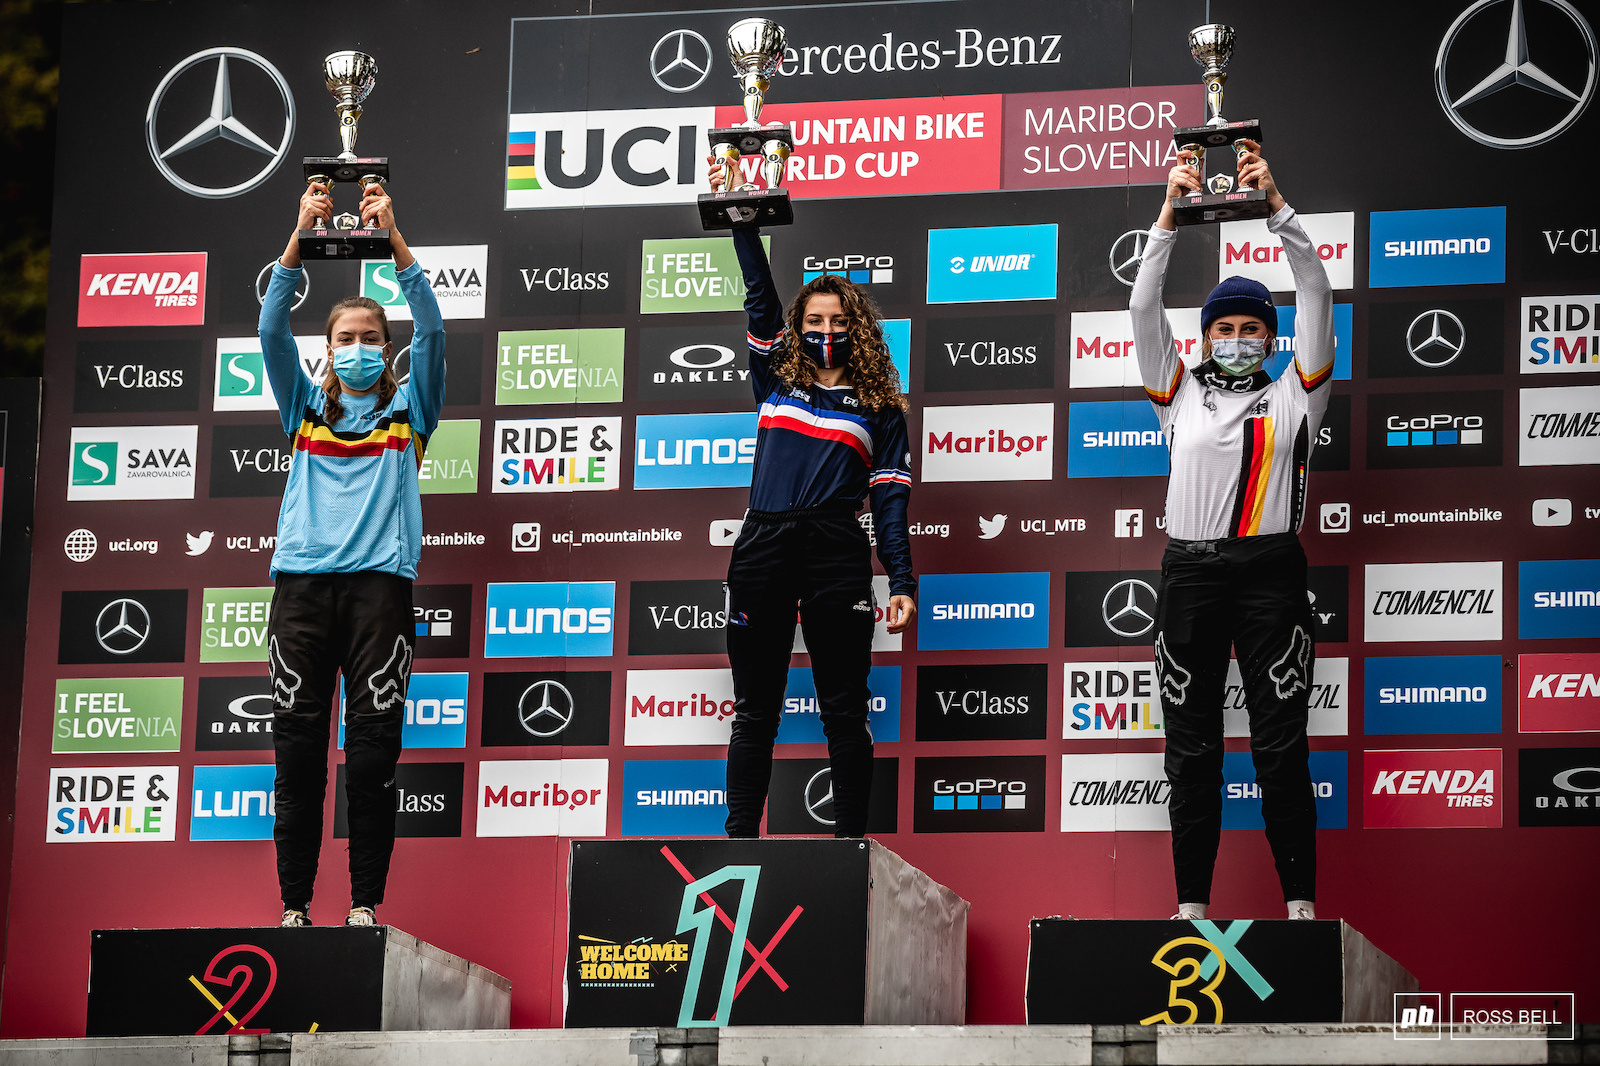 Your top 3 junior women 1st Leona Pierrini 2nd Siel Van Der Velden 3rd Anastasia Thiele